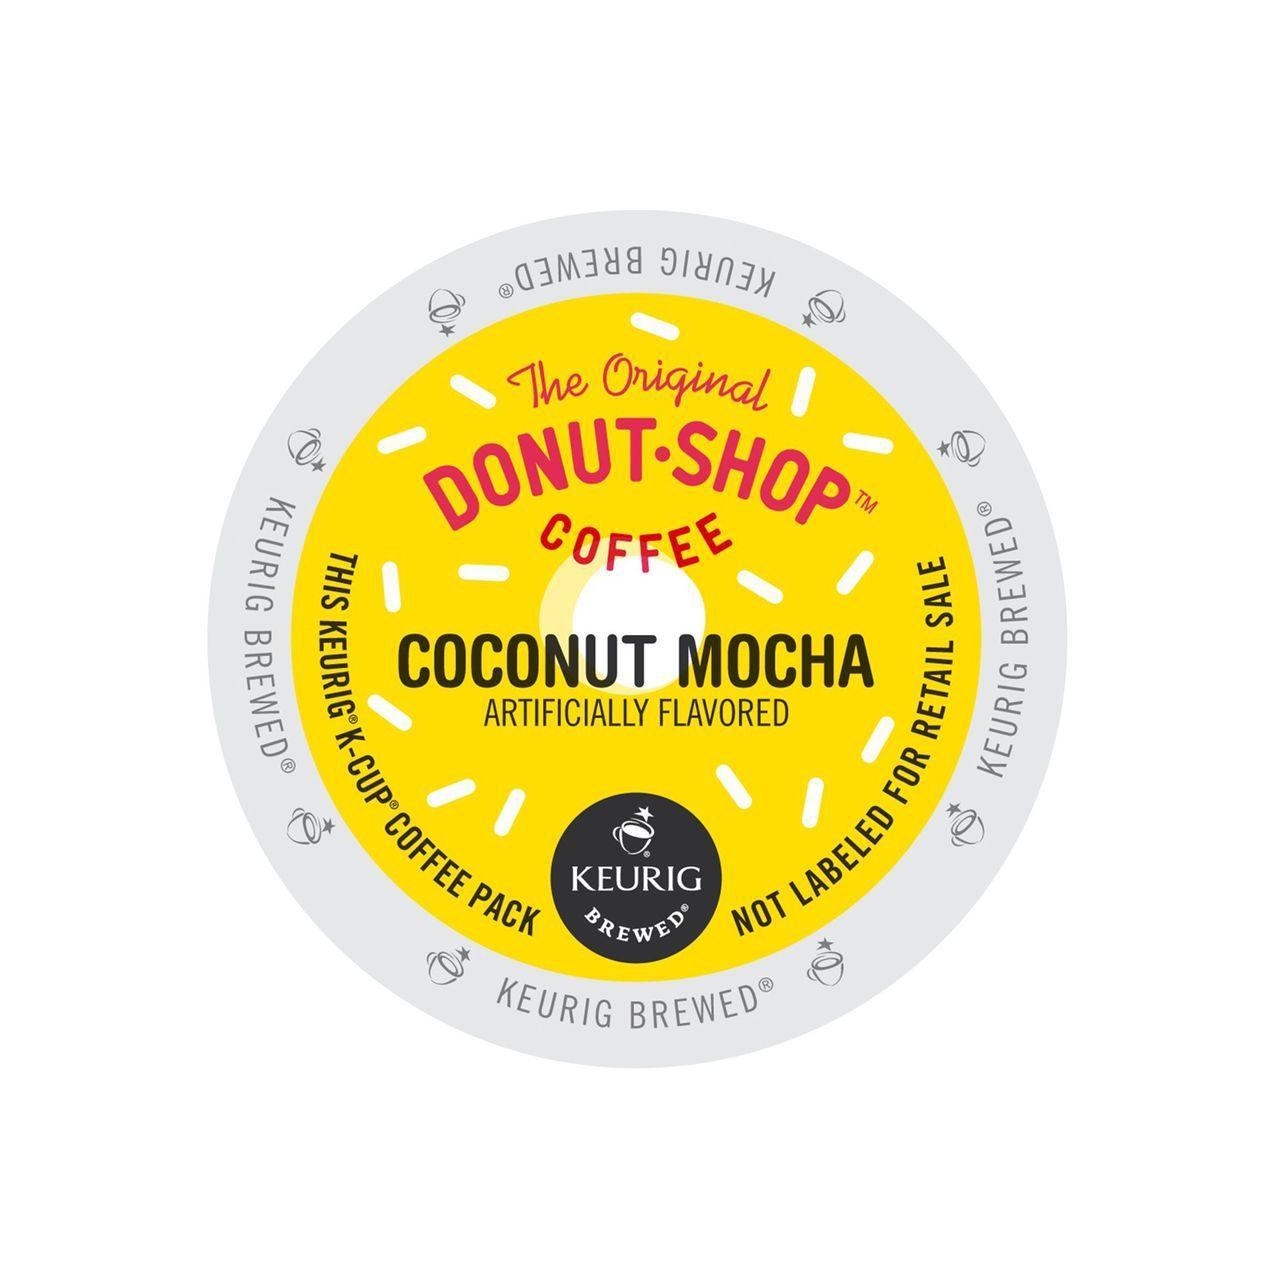 Coconut Mocha Coffee All the fun, none of the calories